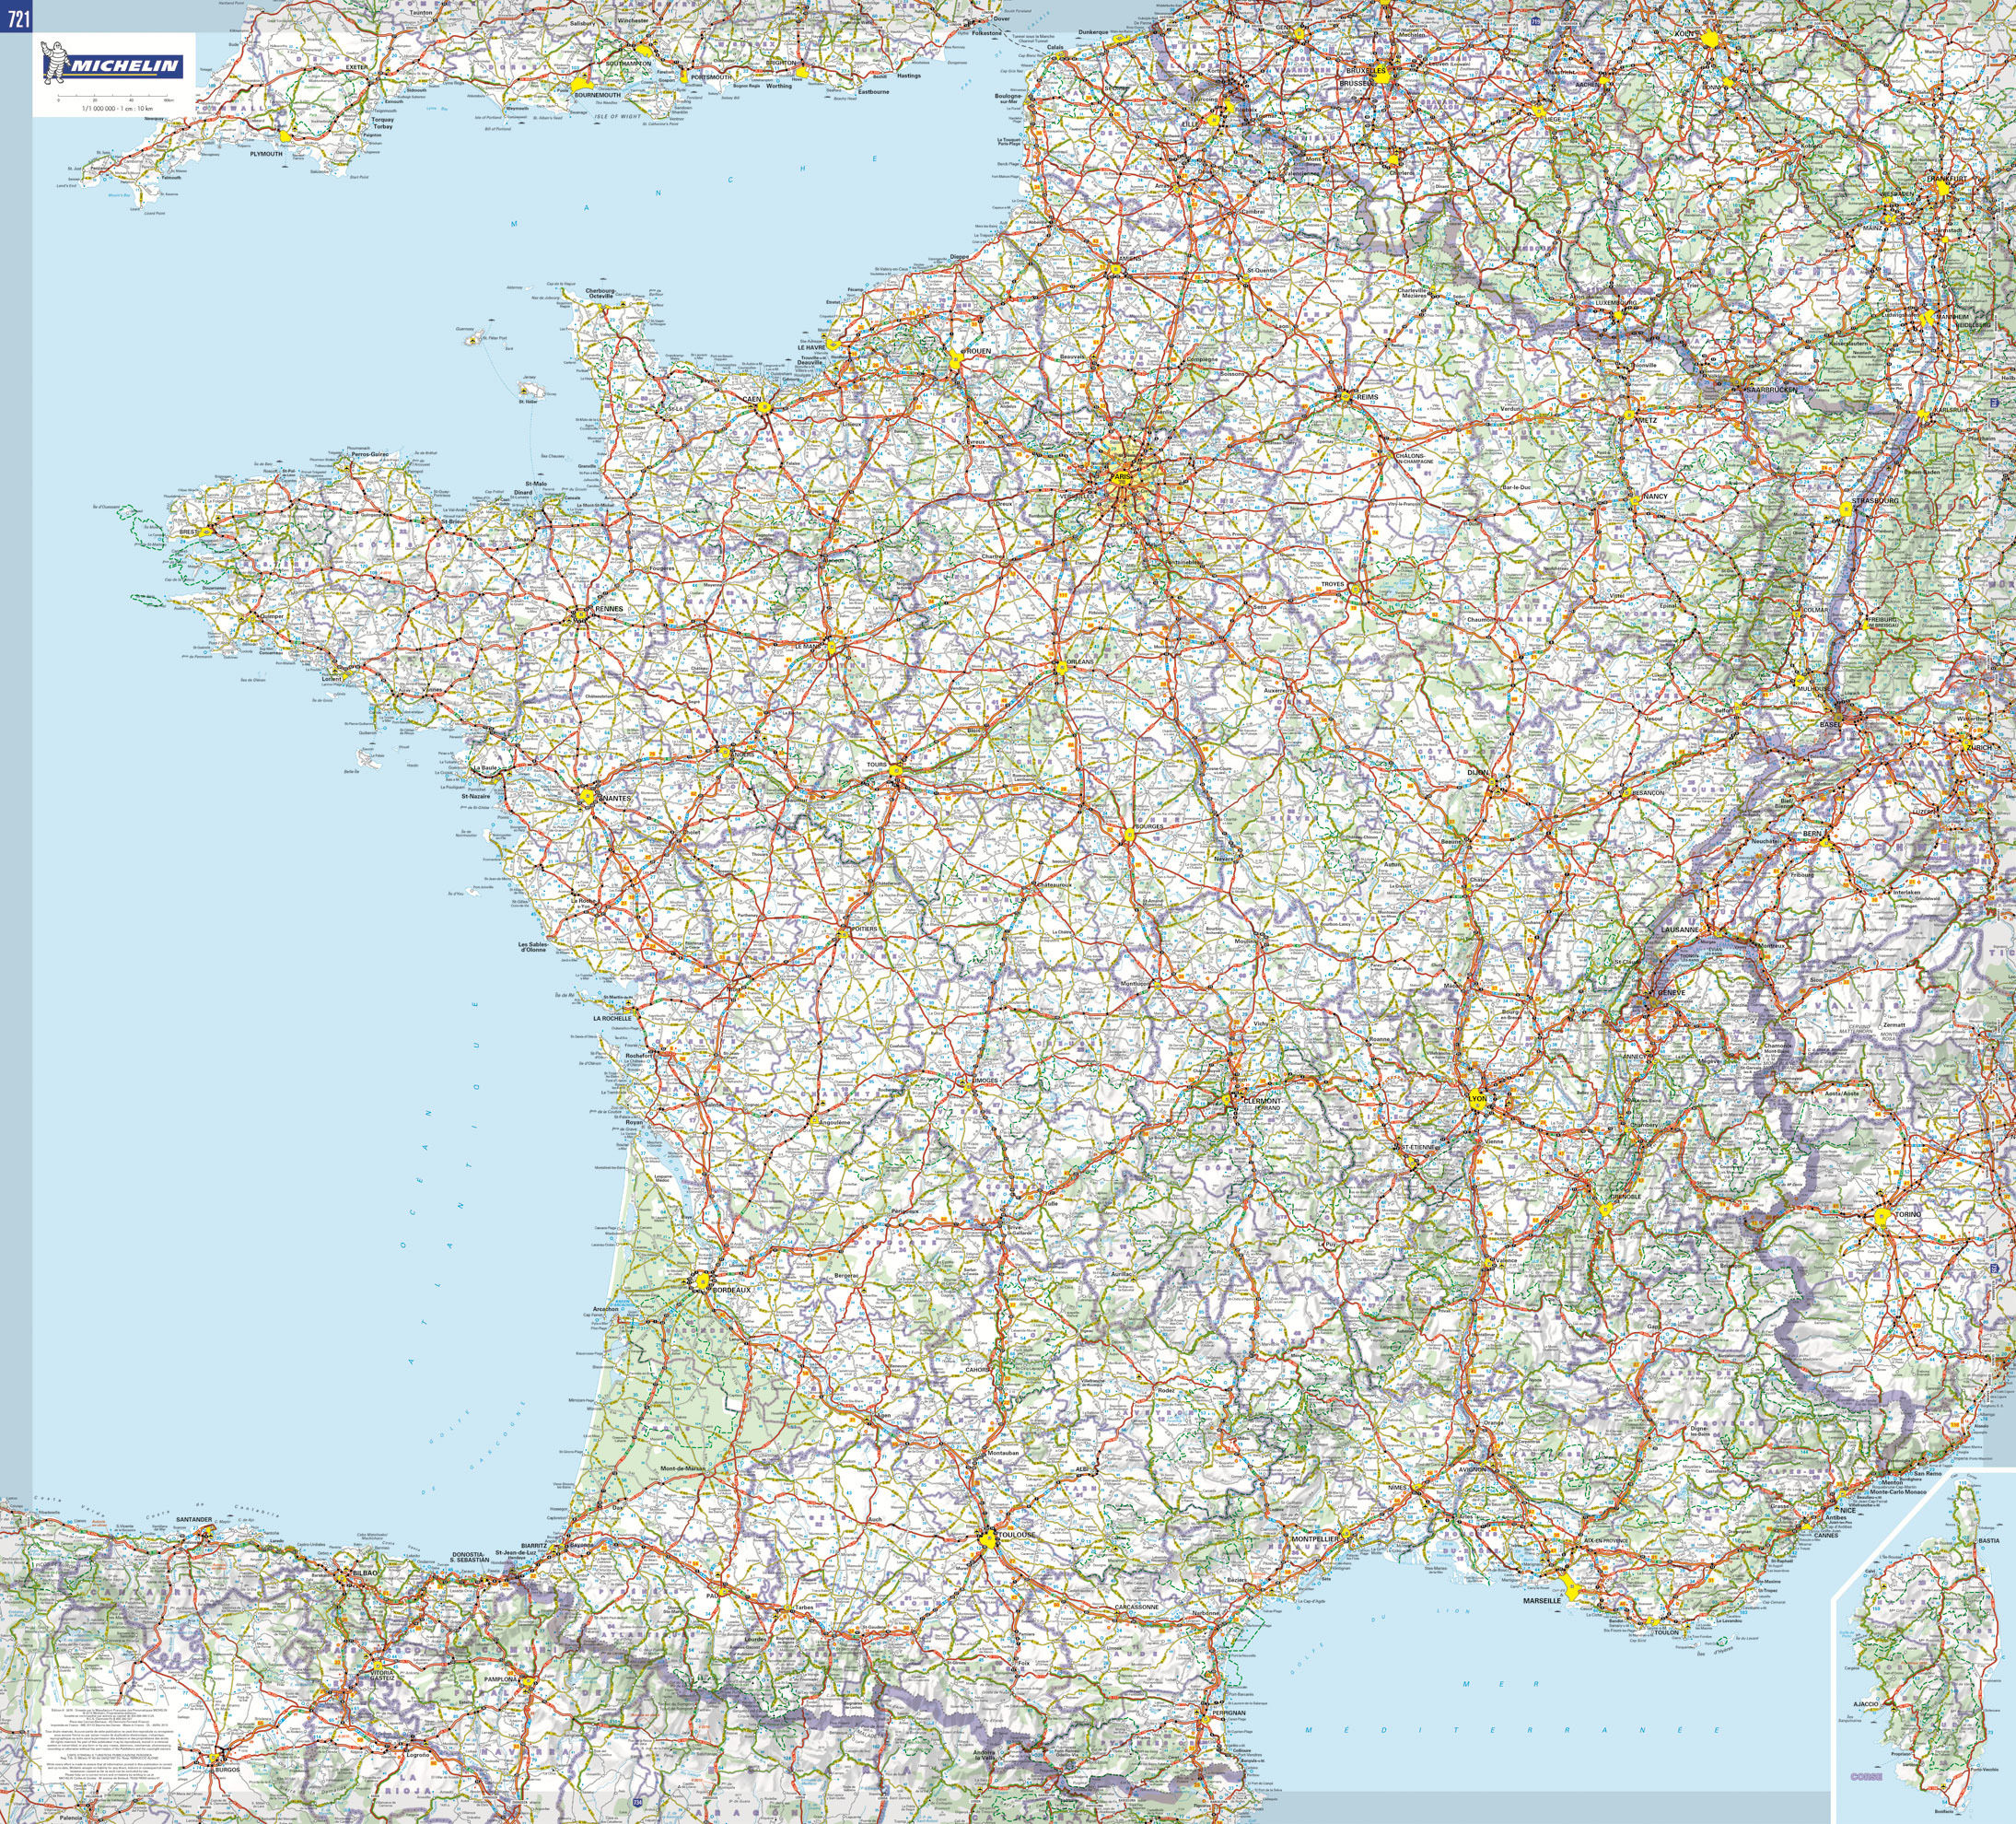 mapa michelin via Michelin Mapa | thujamassages mapa michelin via